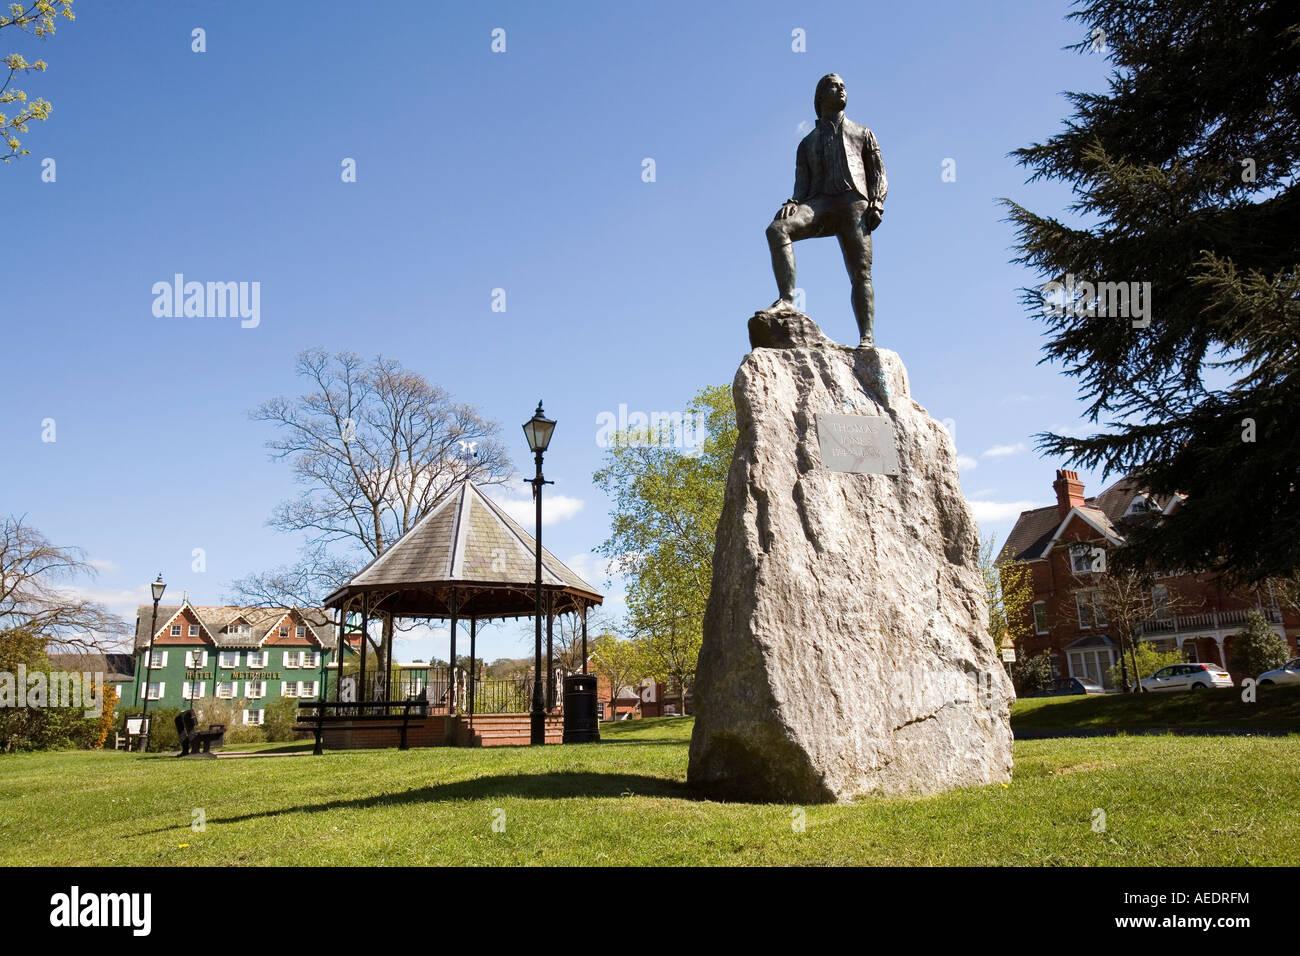 UK Wales Powys Llandrindod Wells South Crescent Gardens statue of artist Thomas Jones Stock Photo